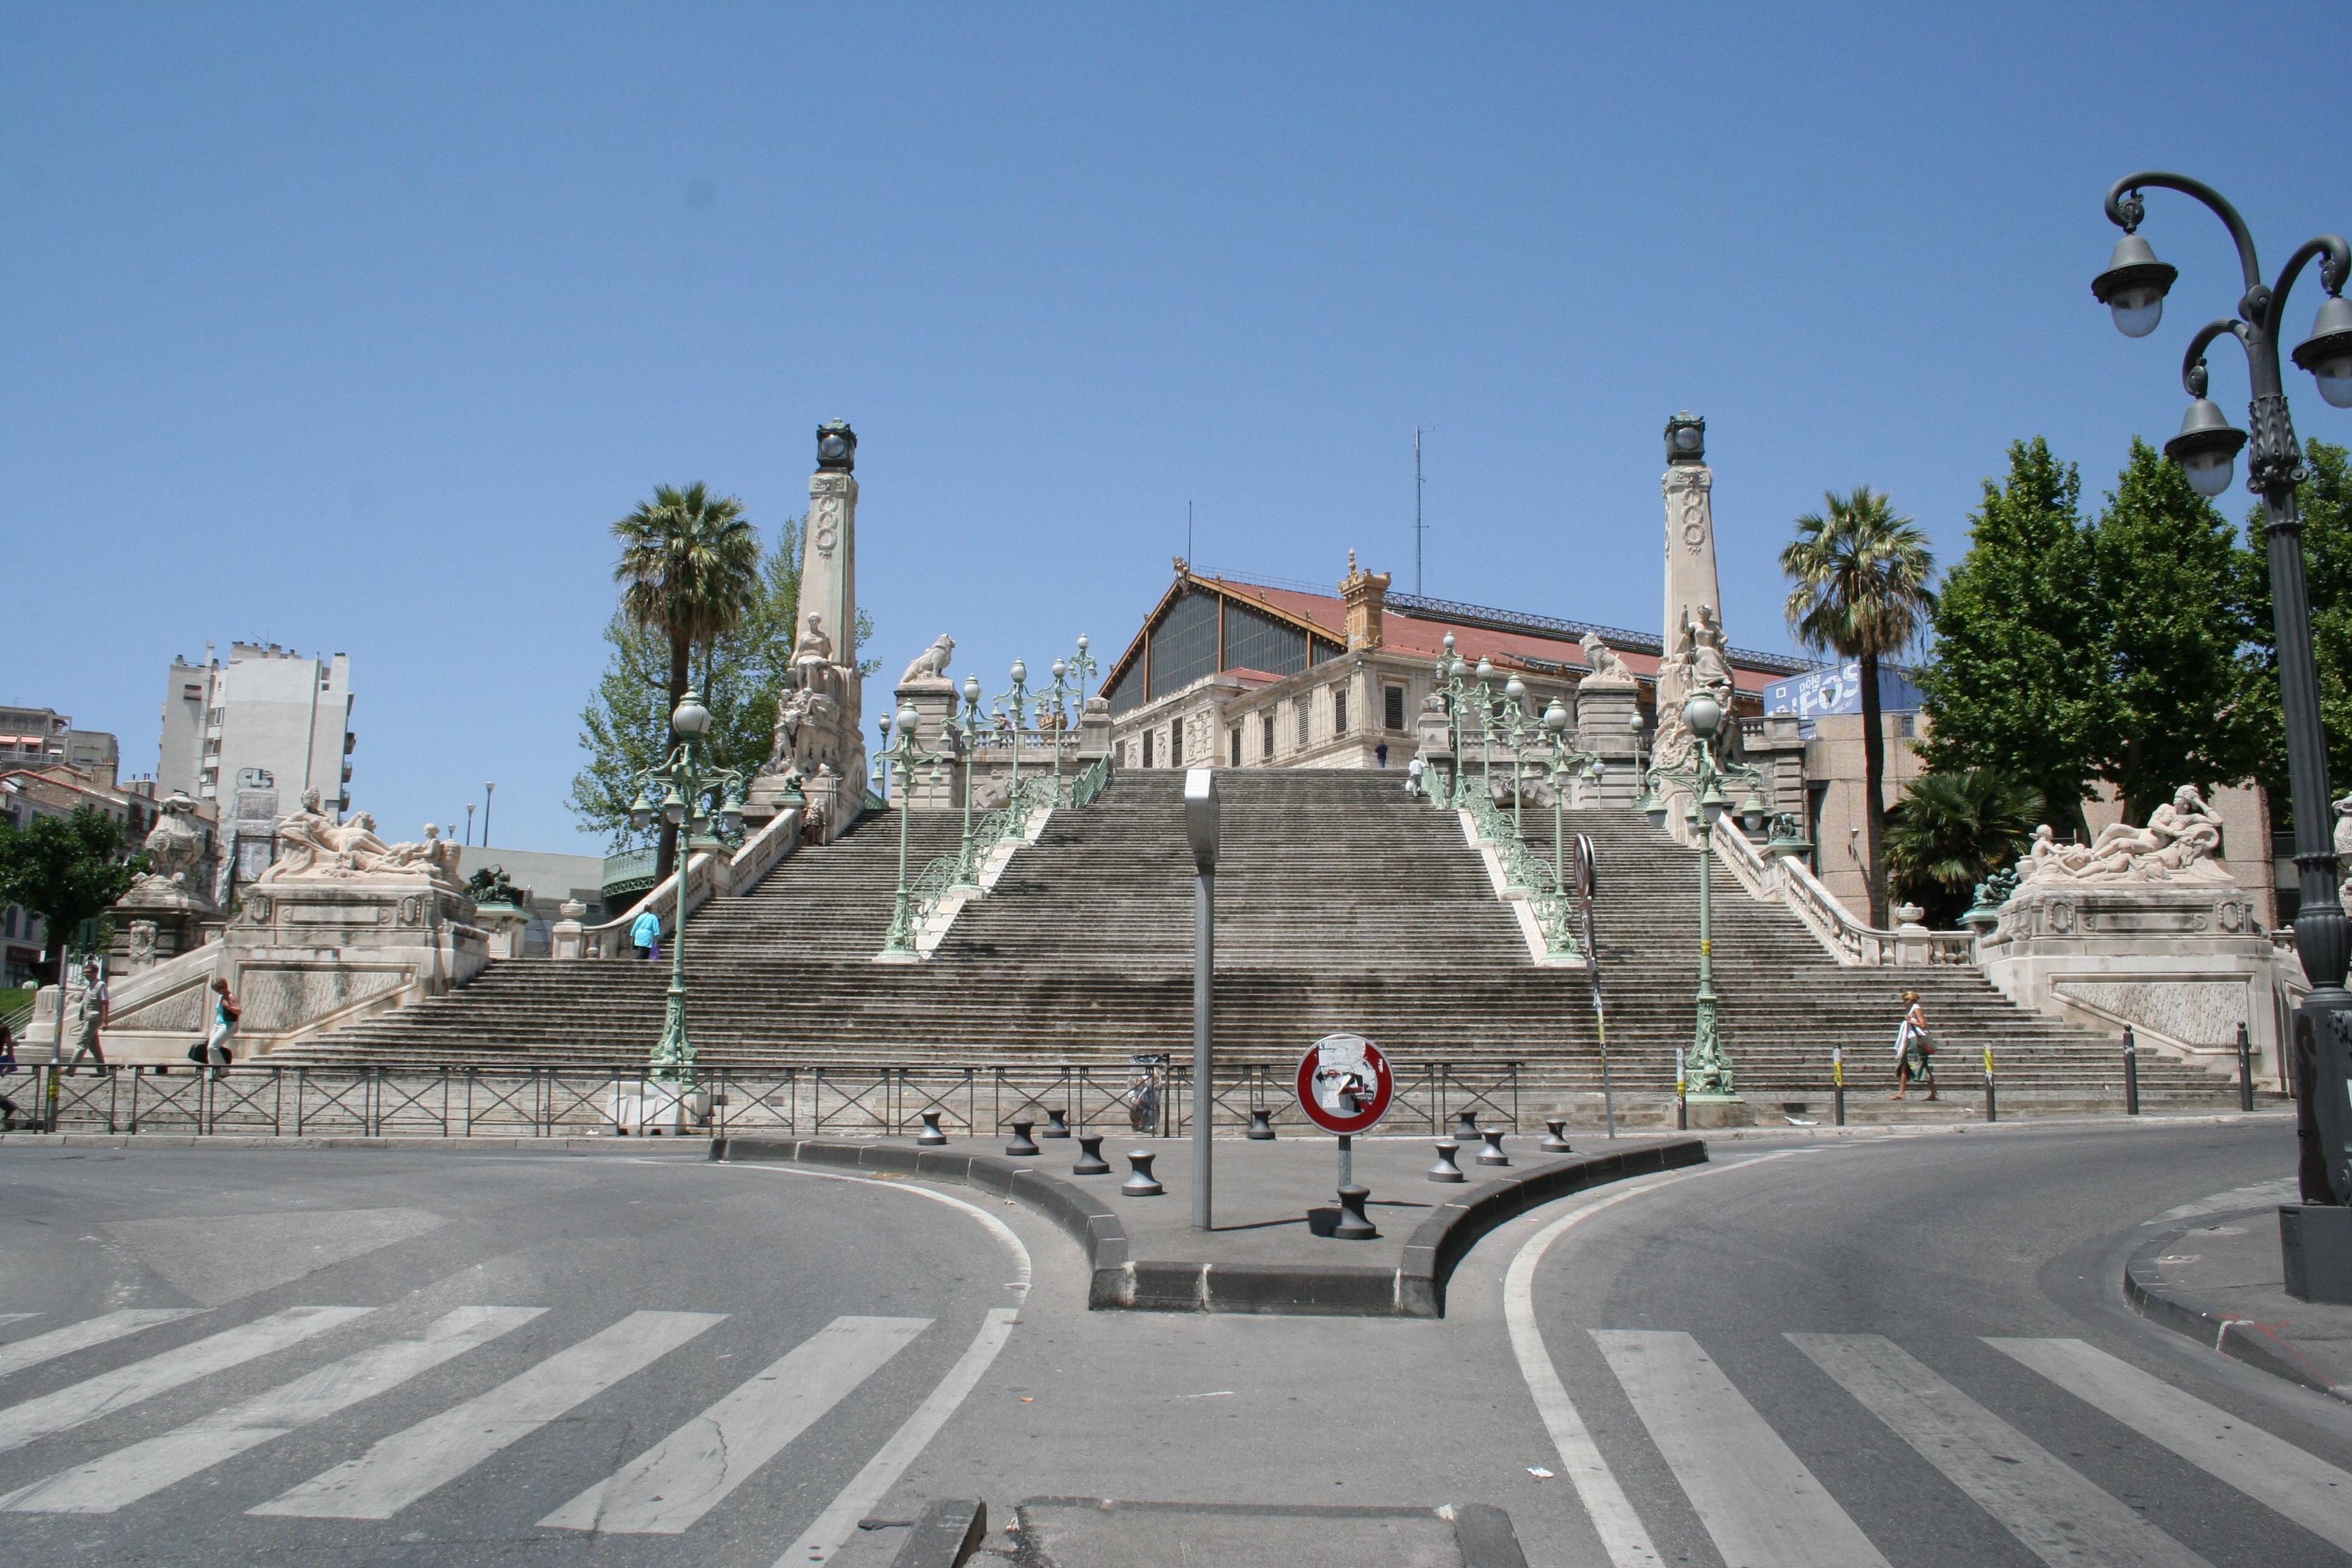 Escalier monumental de la gare marseille saint charles for Escalier helicoidale marseille